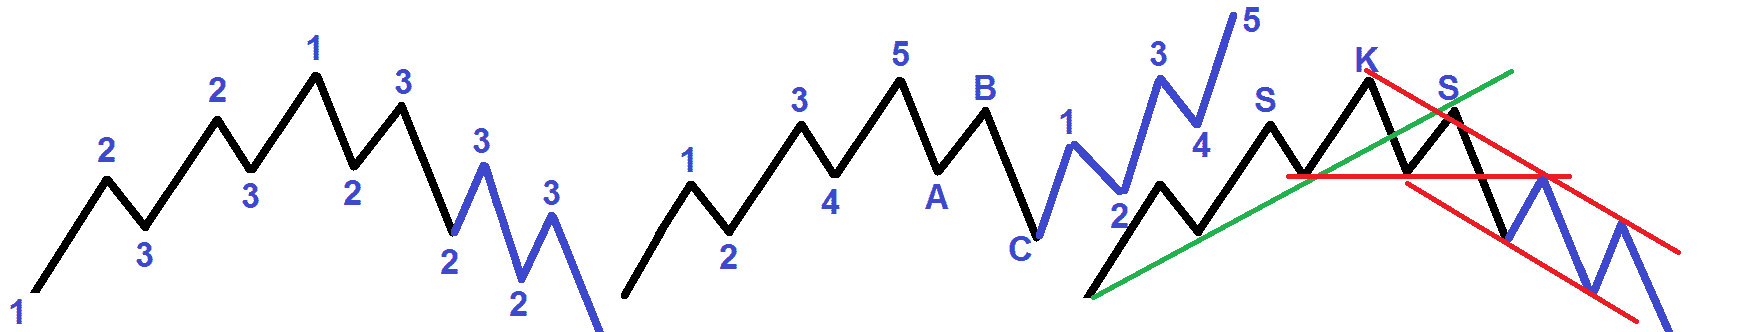 Elliott-Wellen Trendfortsetzung